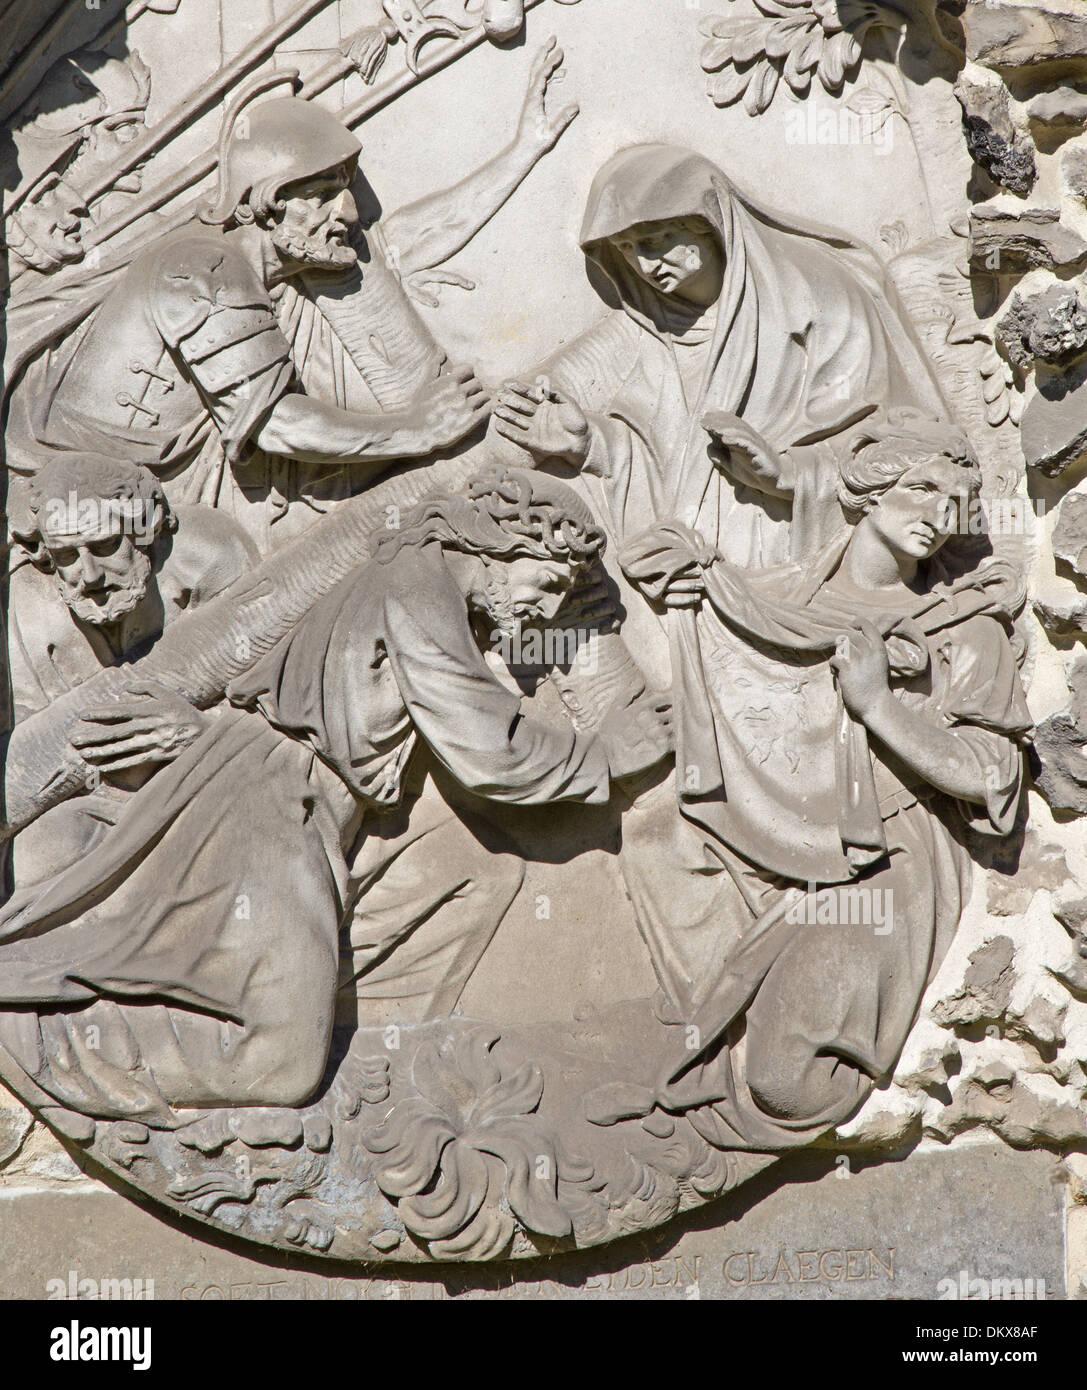 ANTWERP, BELGIUM - SEPTEMBER 5: Stone relief of Jesus fall under the cross from calvary beside St. Pauls church (Paulskerk) - Stock Image